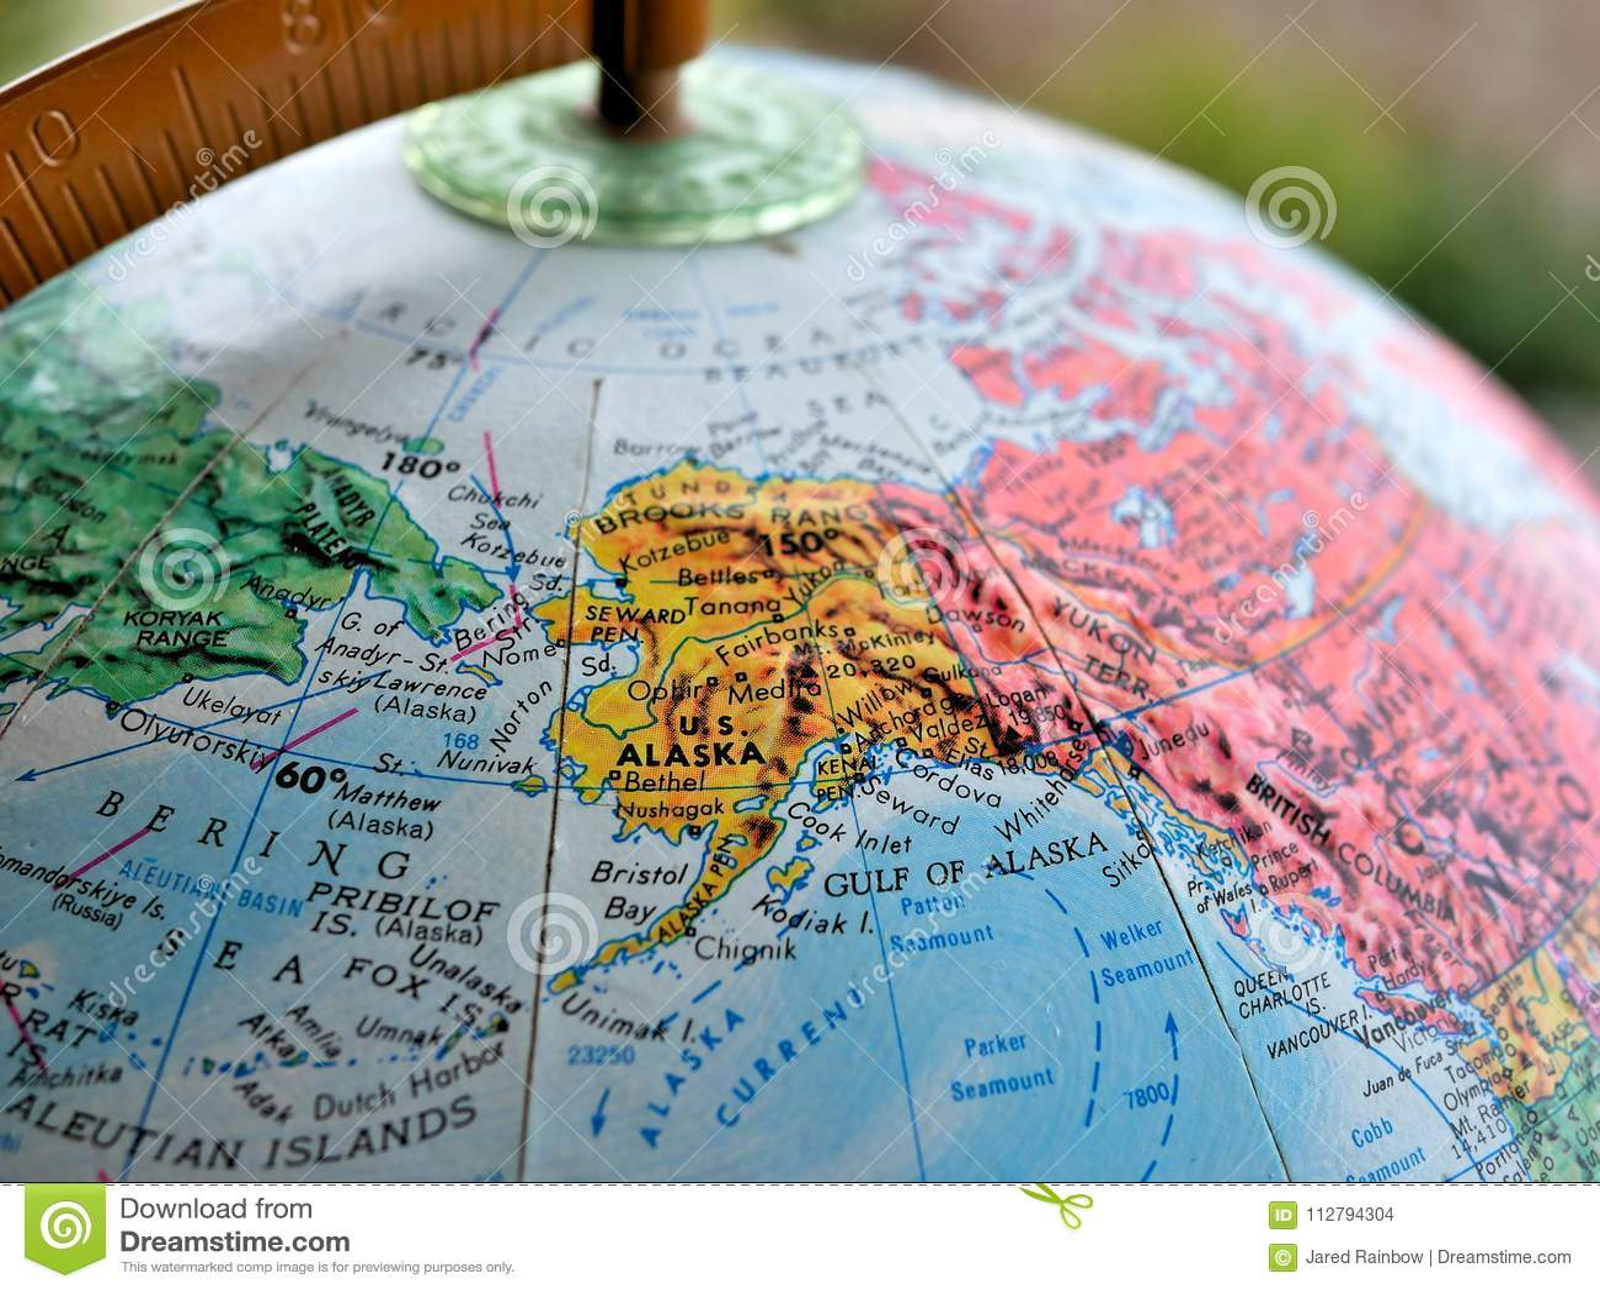 State Of Alaska Focus Macro Shot On Globe Map For Travel ...